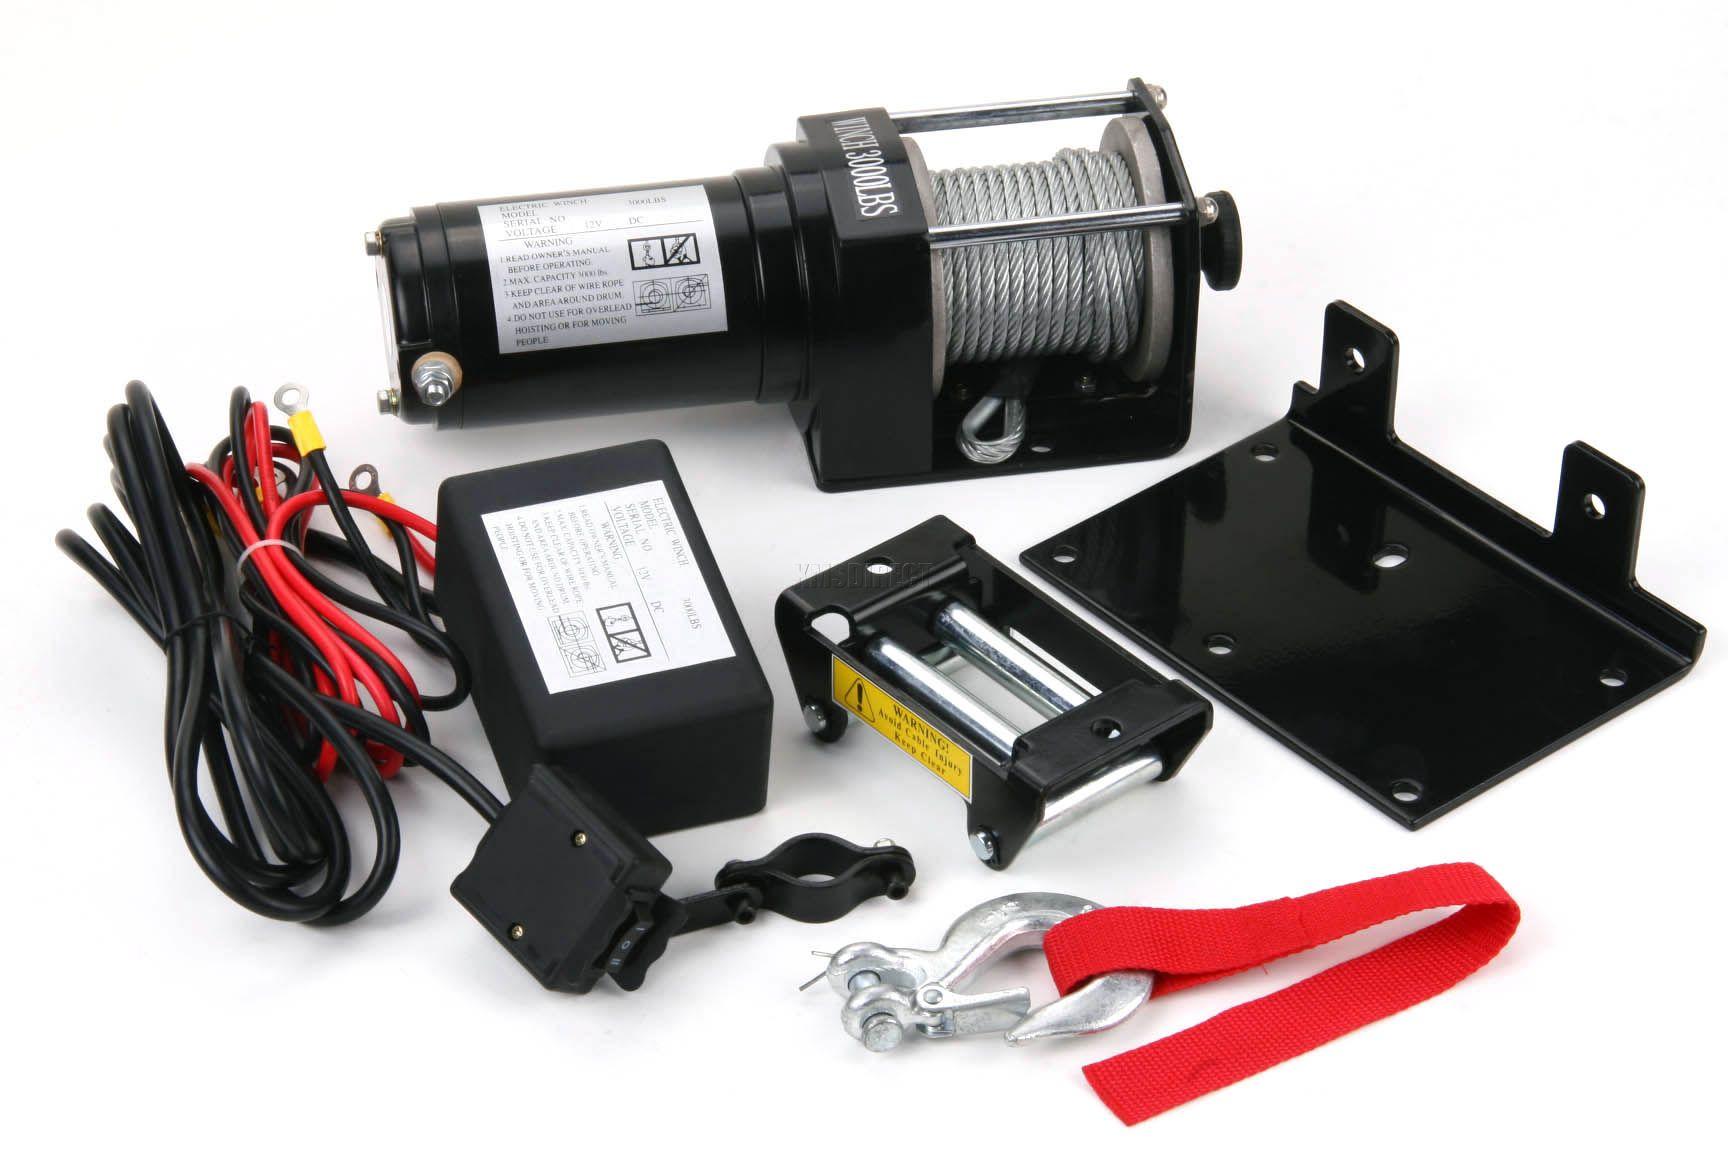 3500 lb electric winch 12v volt with remote control quad. Black Bedroom Furniture Sets. Home Design Ideas